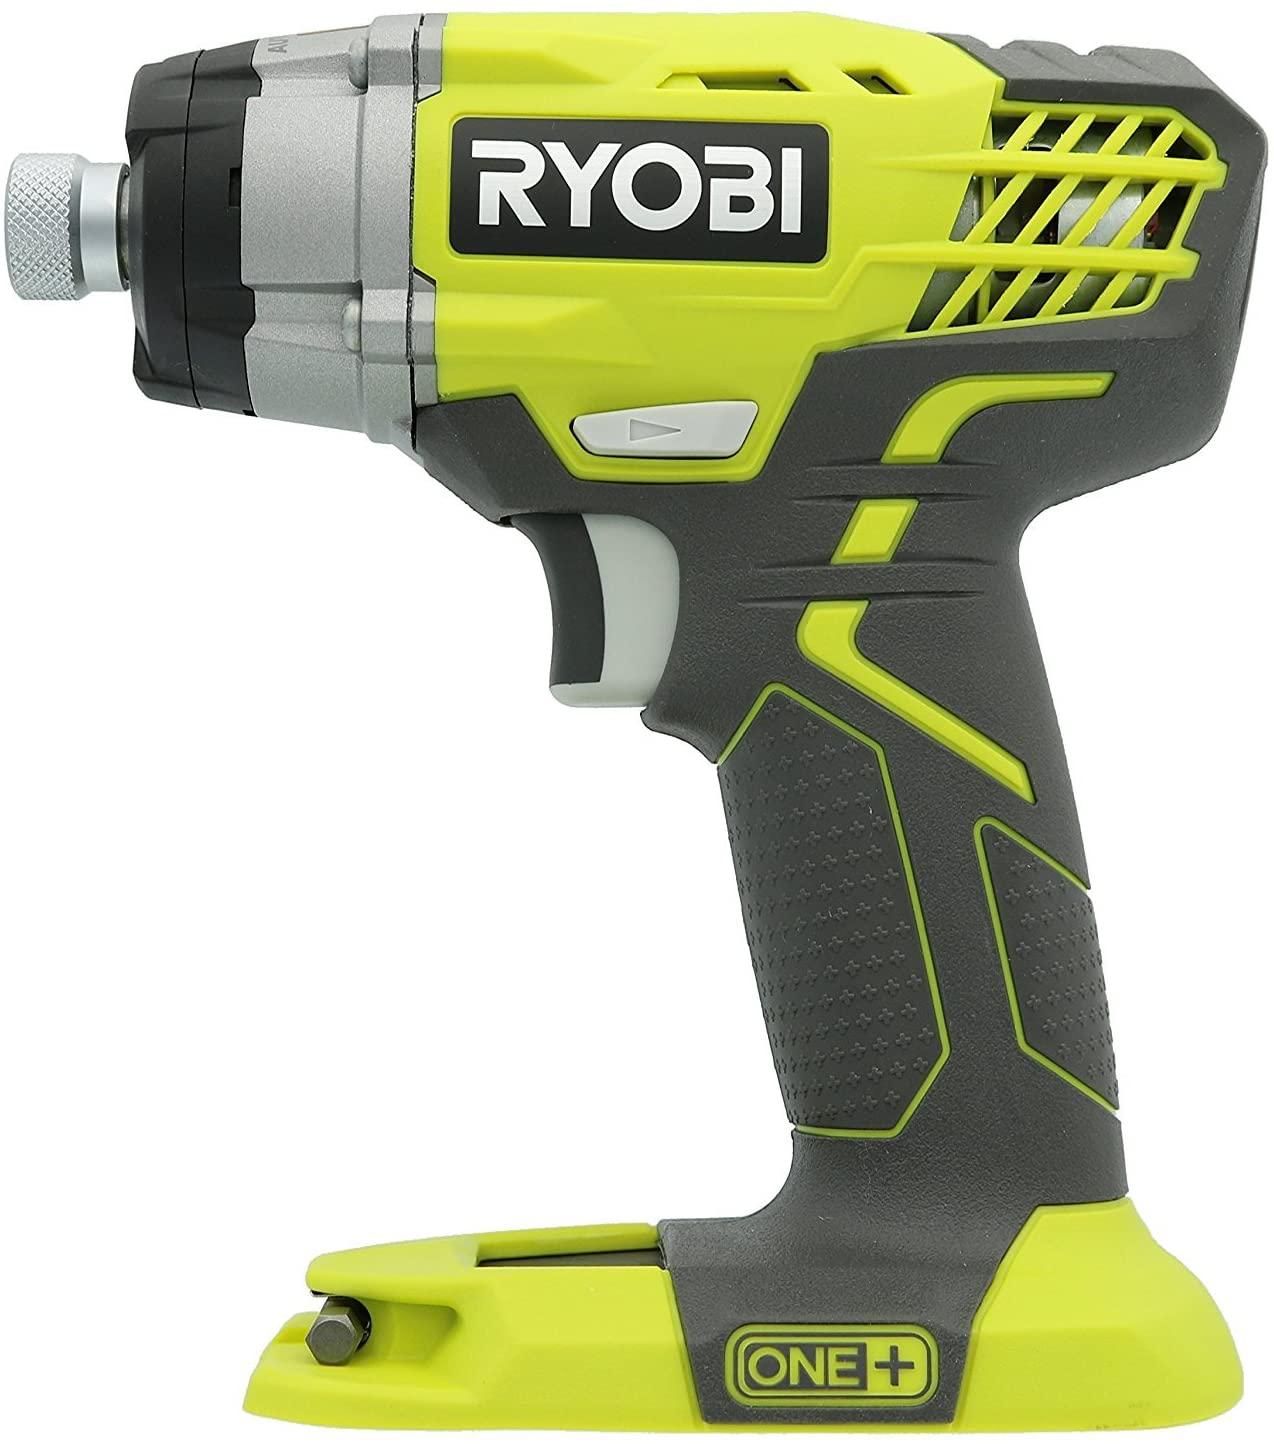 Ryobi P884 18V ONE+ impact driver